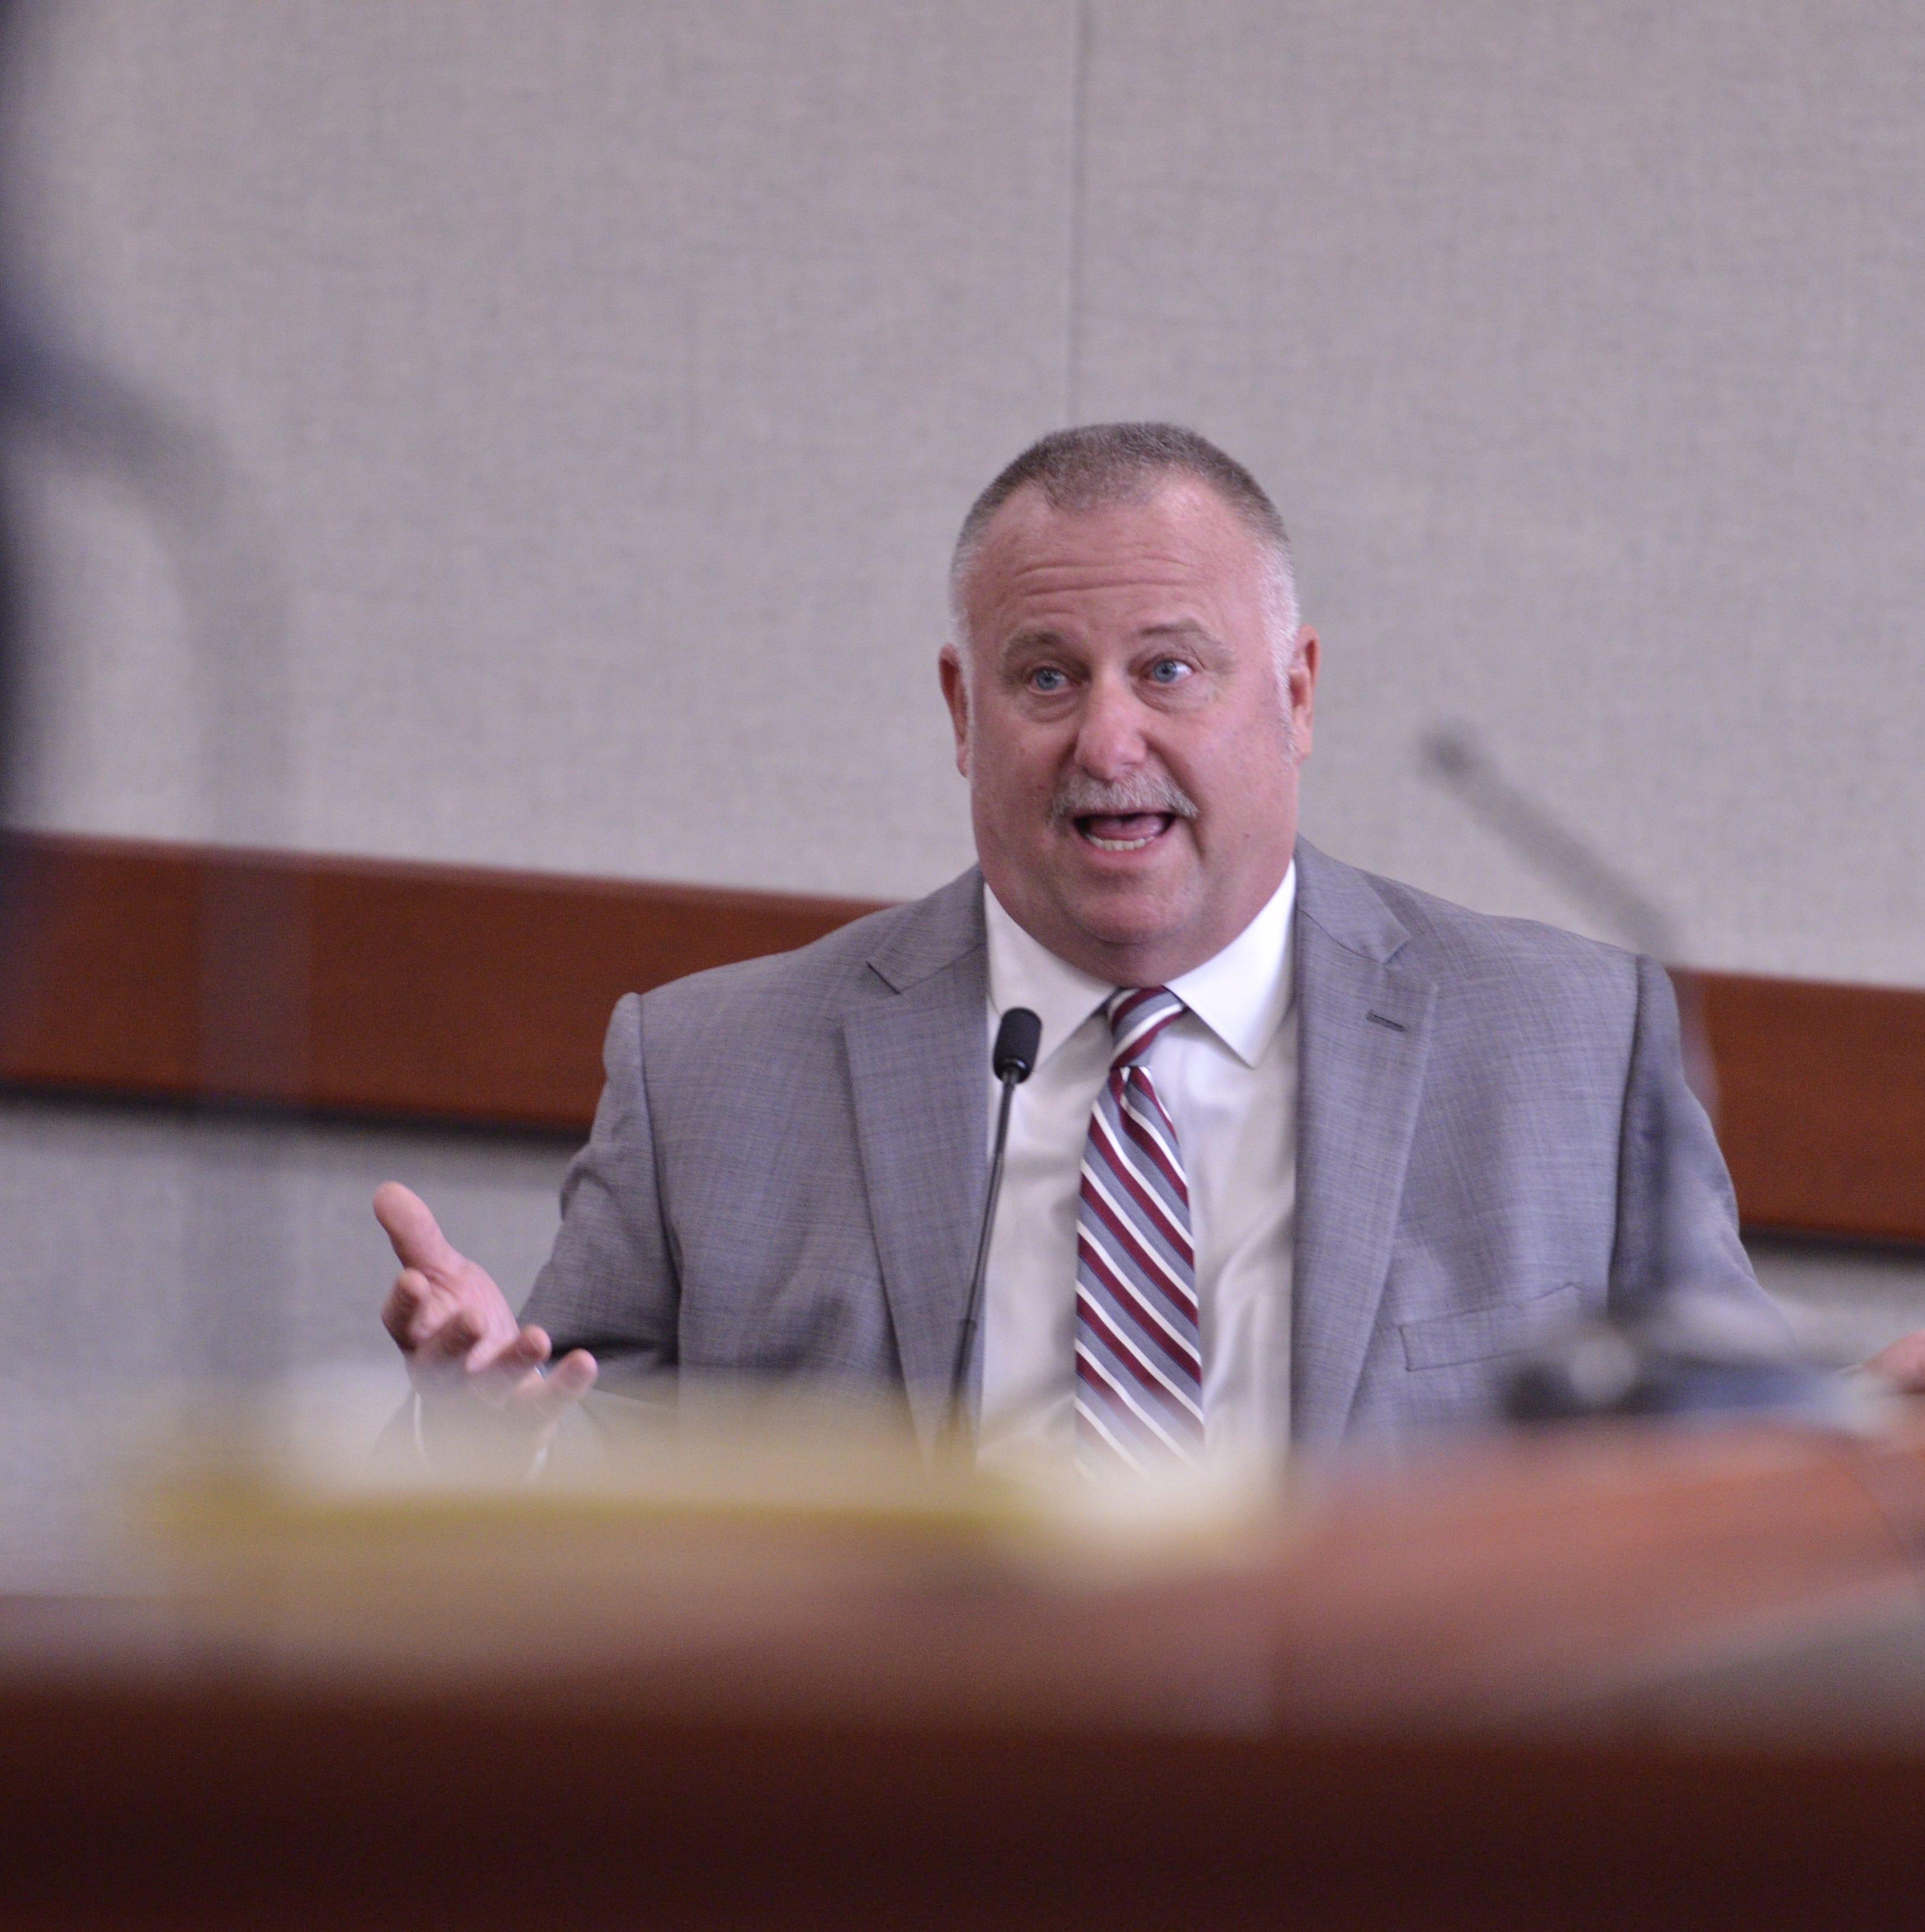 Burlington teacher trial: Judge declares mistrial, prosecutors look to retry